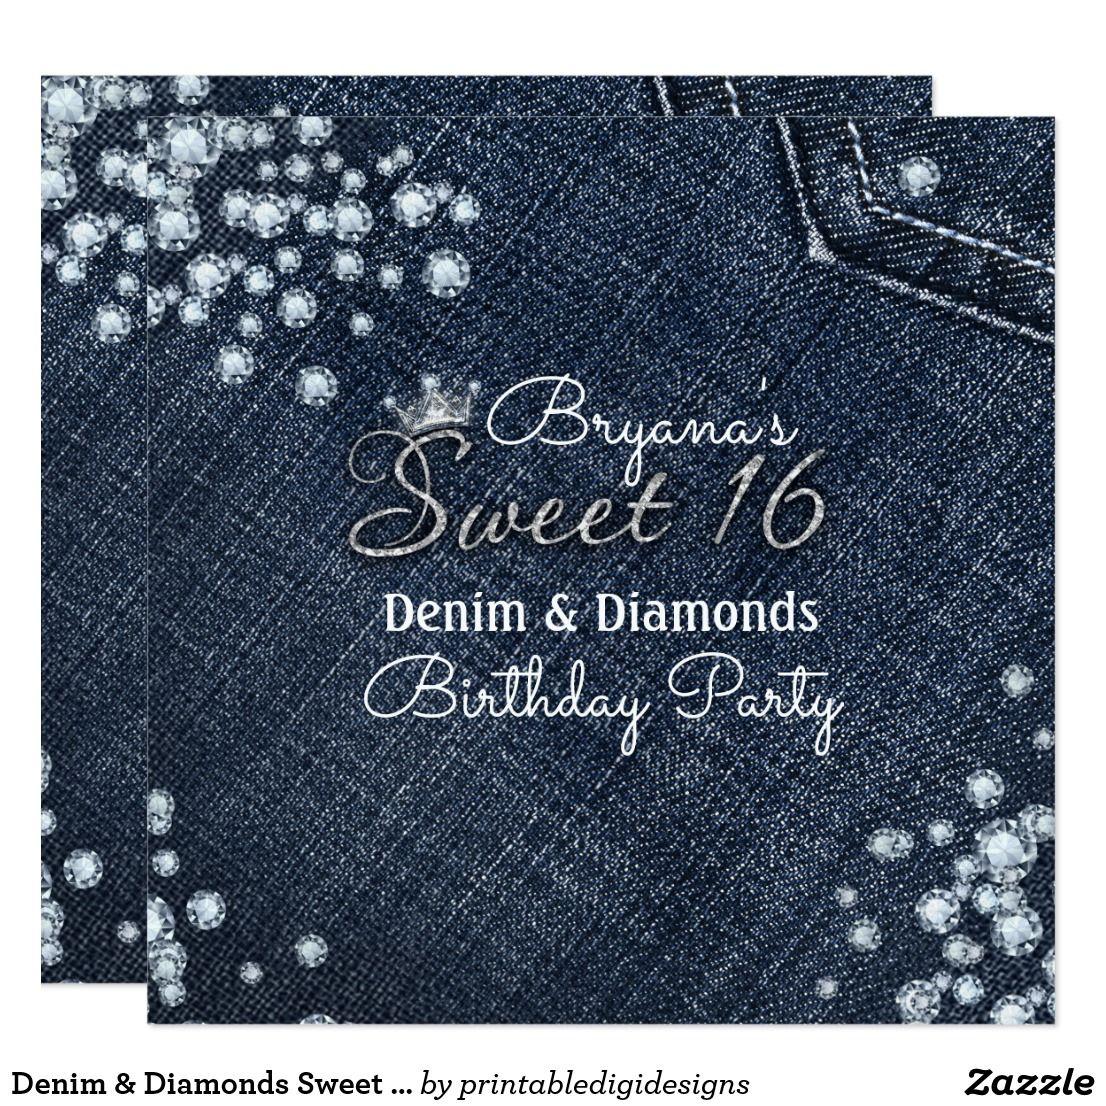 Denim & Diamonds Sweet 16 Crown Party Invitations Denim & Diamonds ...